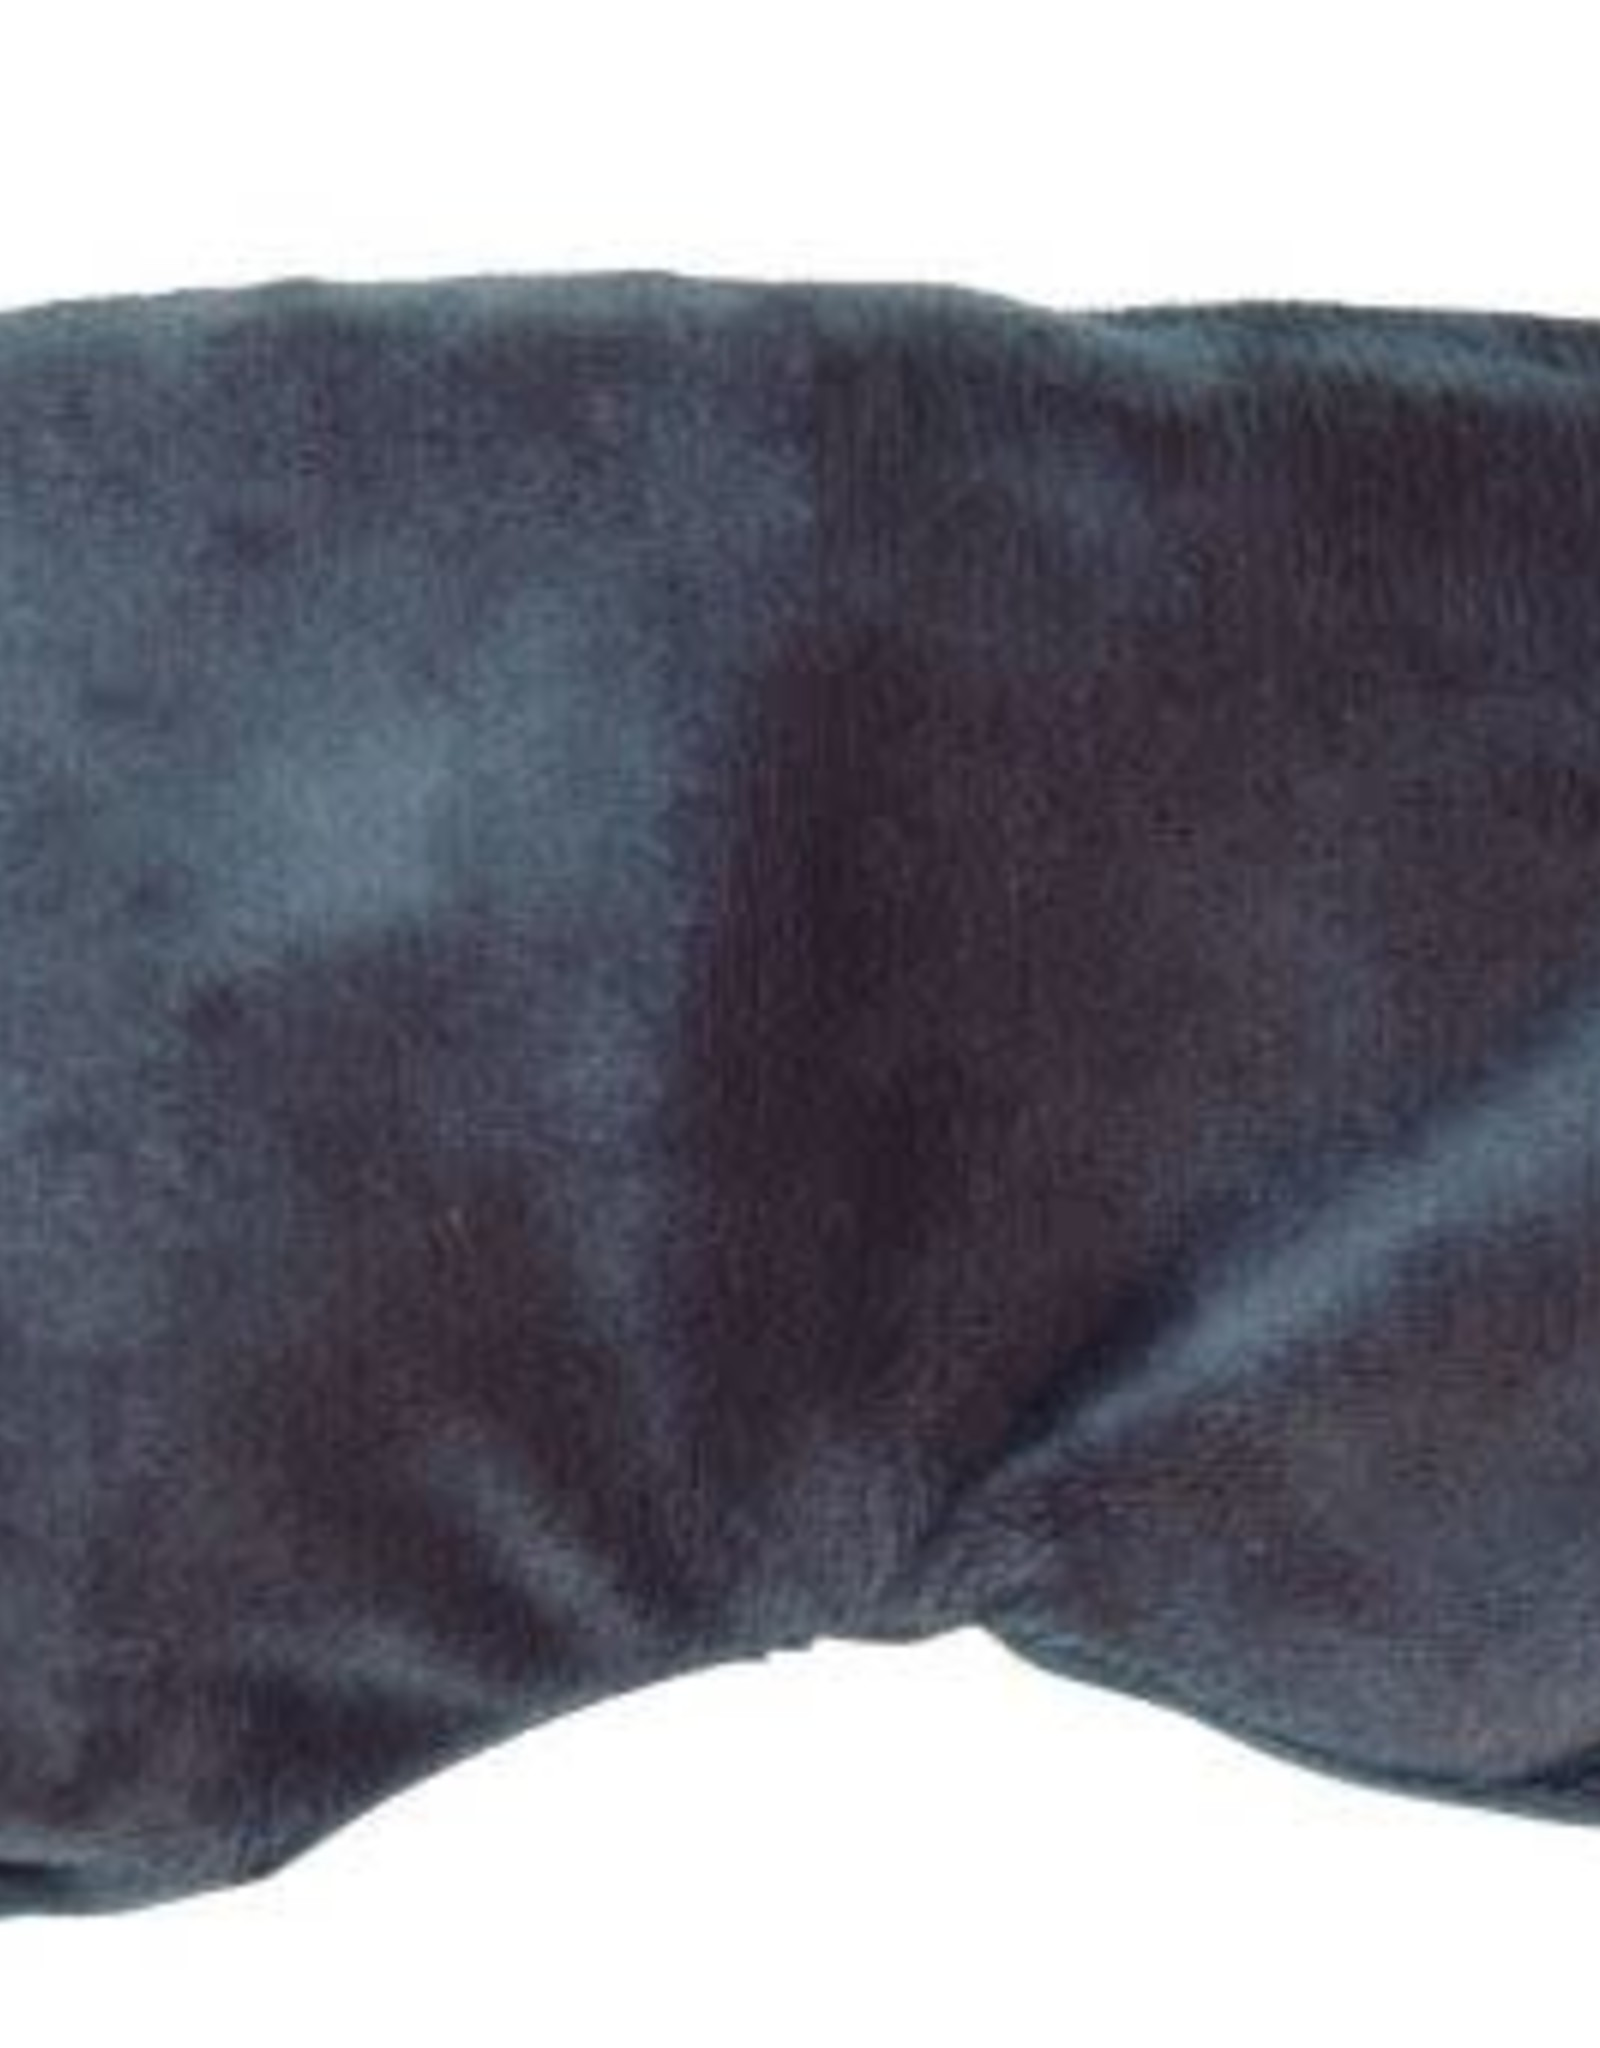 Aromatherapy Clay Bead Eye Mask-Navy/Lavender